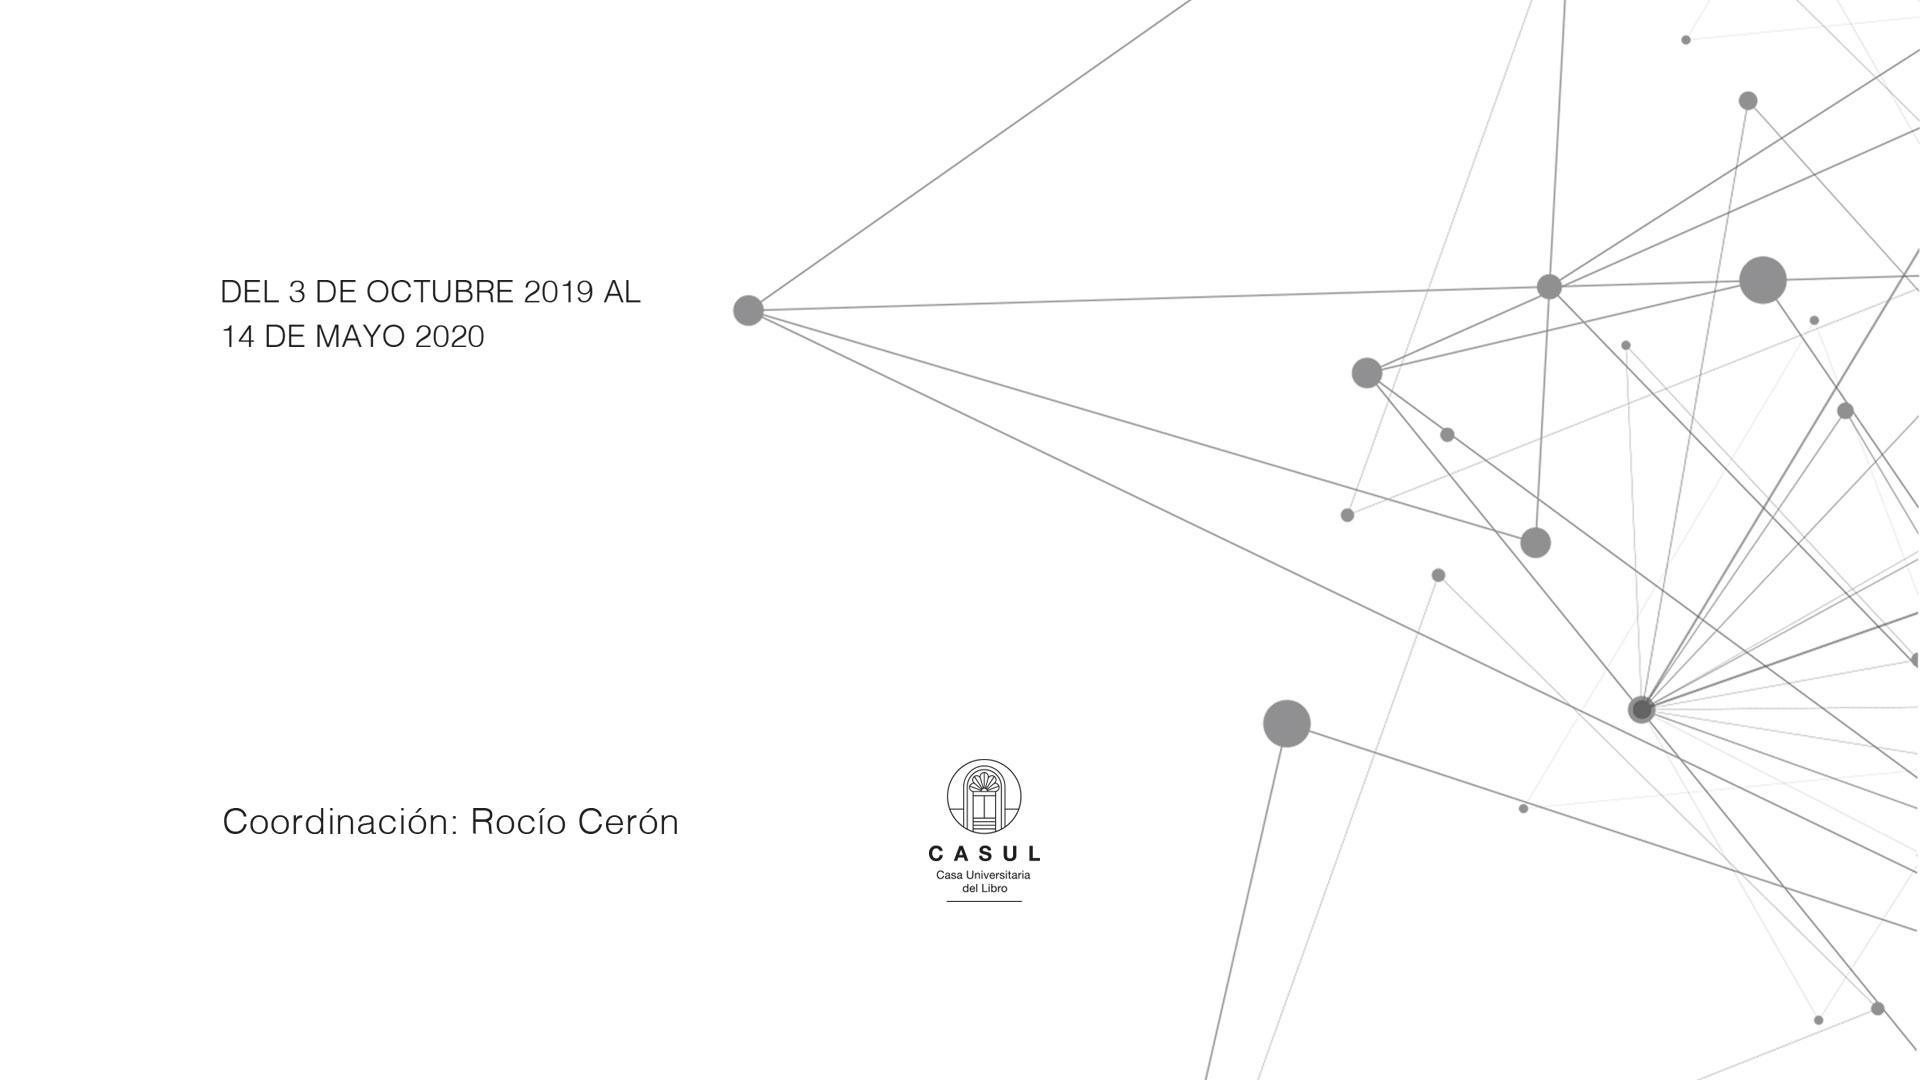 Diplomado  Lenguaje, ciencia y arte en expansión. Diálogos entre campos de saber